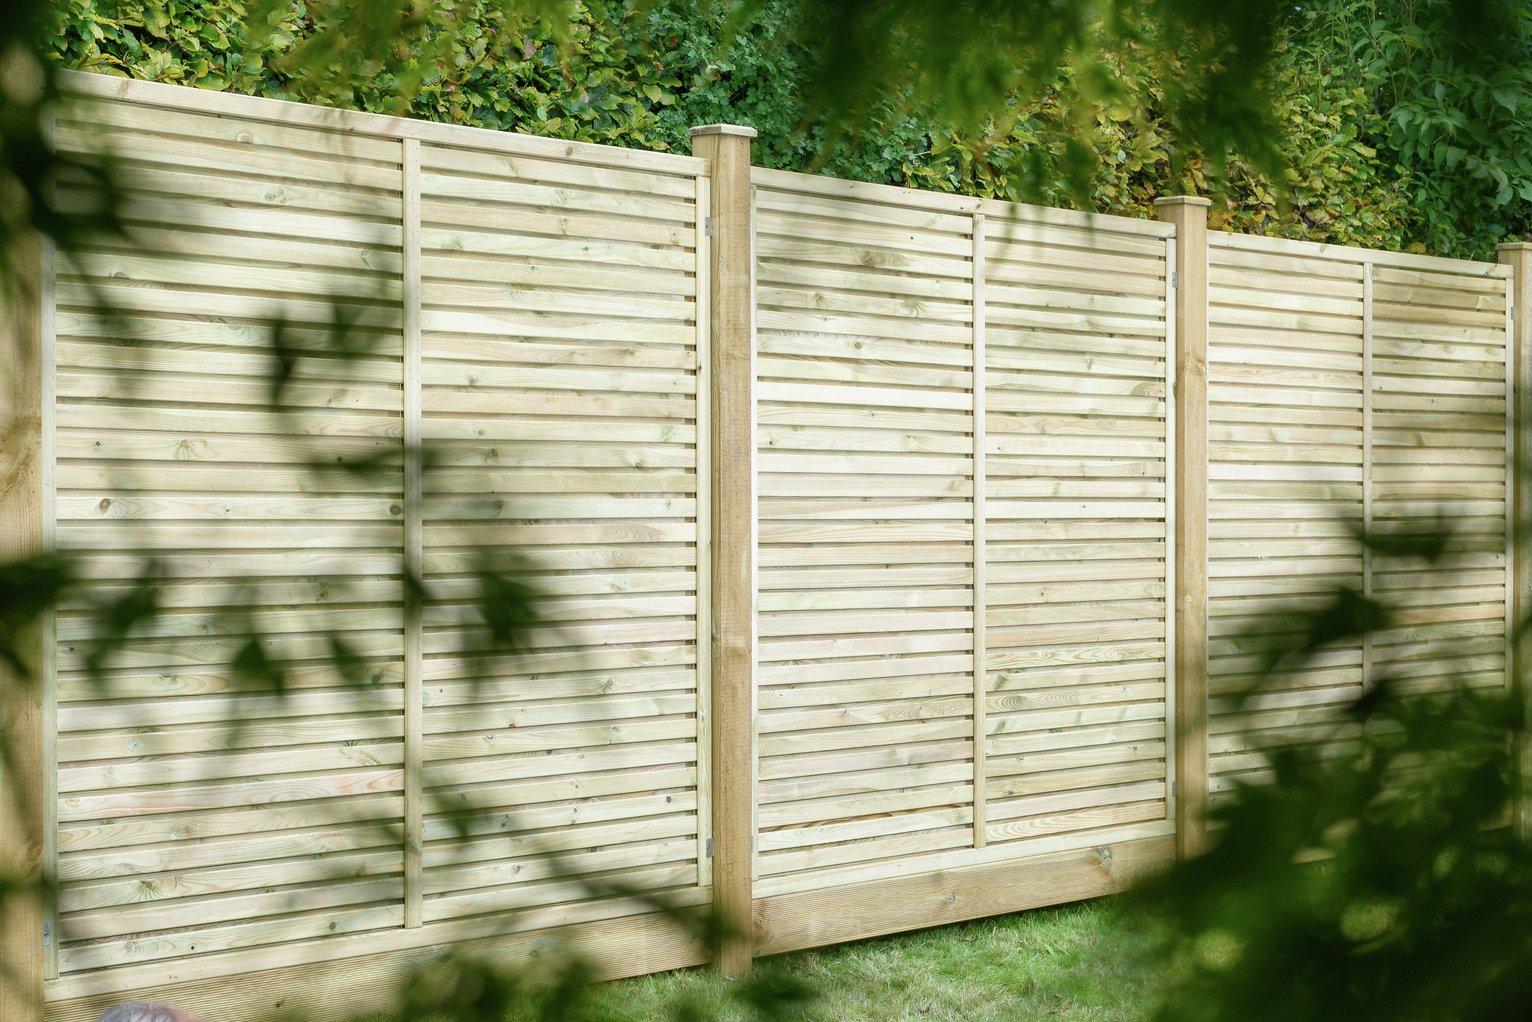 Grange Fencing 1.2m Contermporary Vogue Panel - Pack of 3